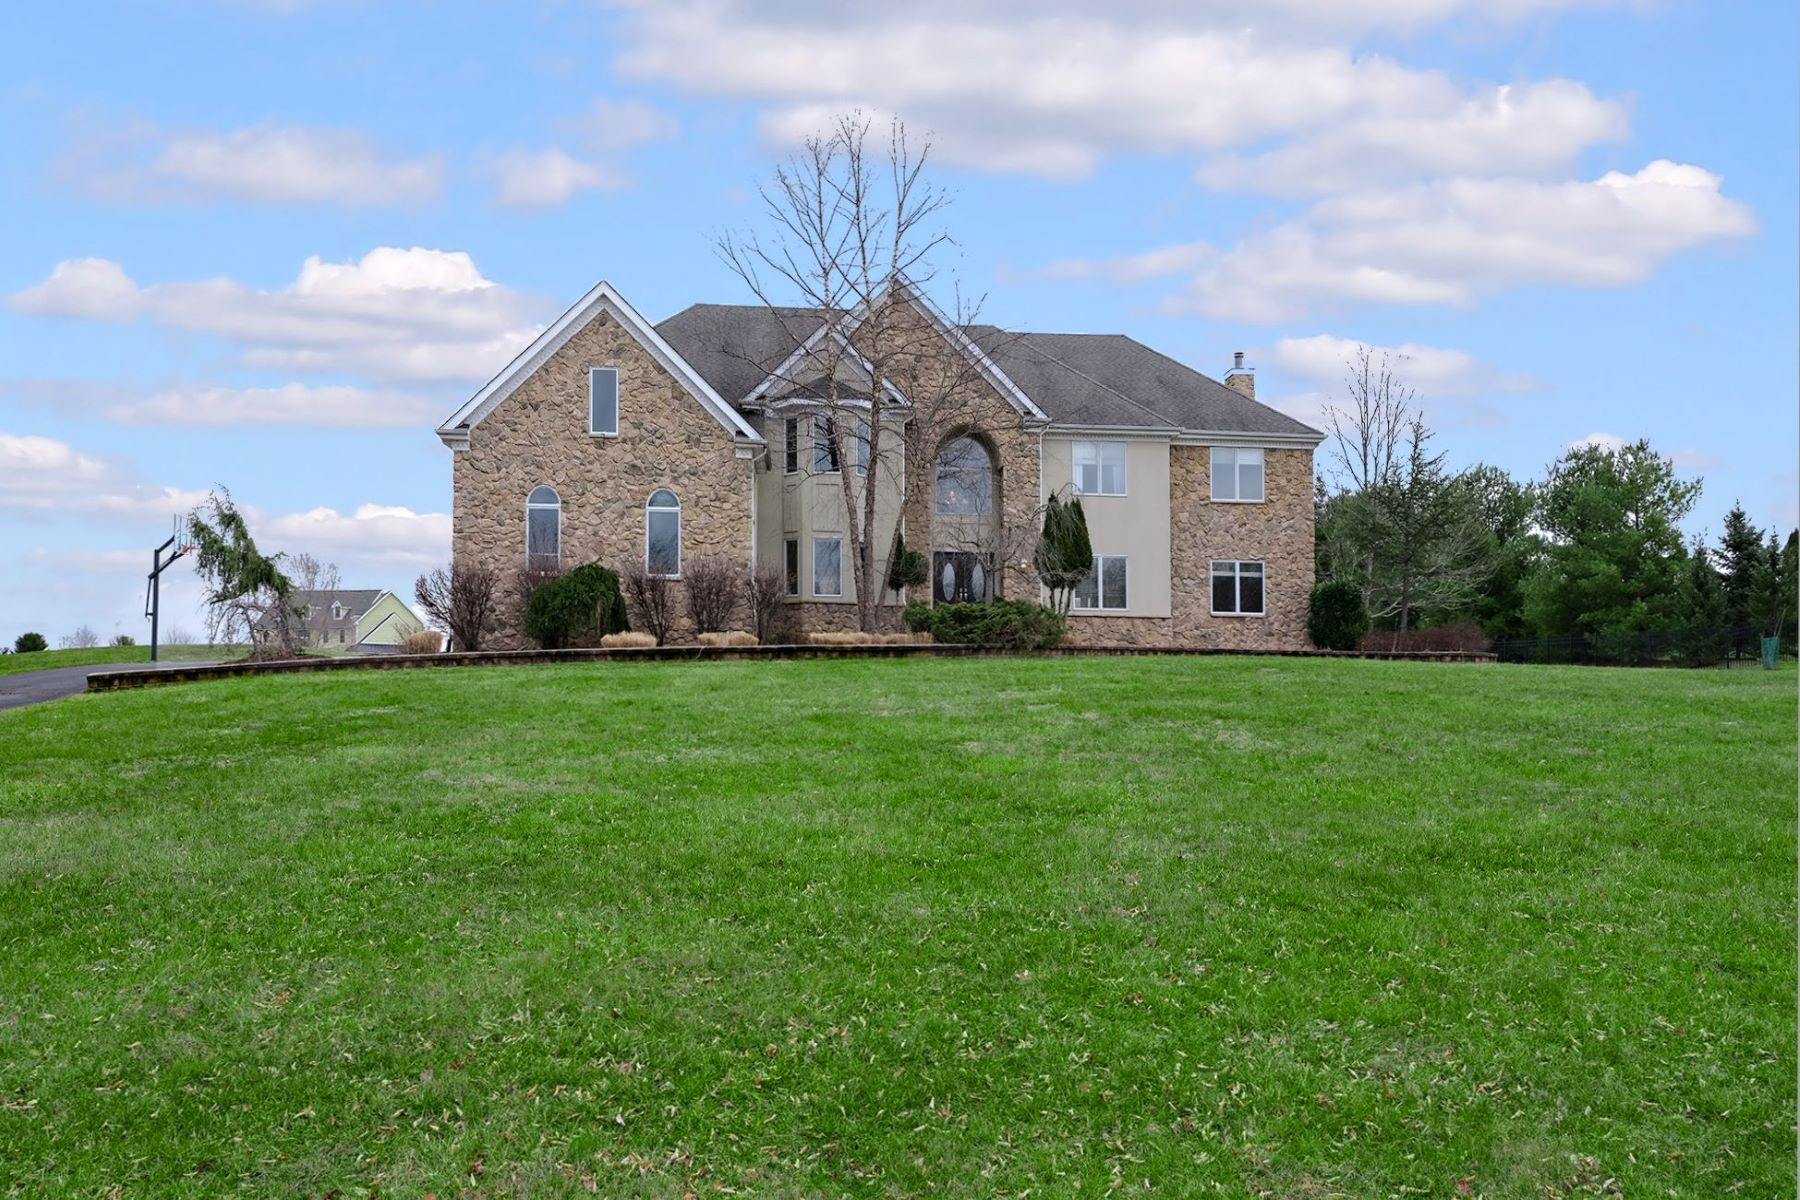 Big And Bright Estate Home Bordering Pennington Borough 4 Roosevelt Avenue, Pennington, New Jersey 08534 États-Unis